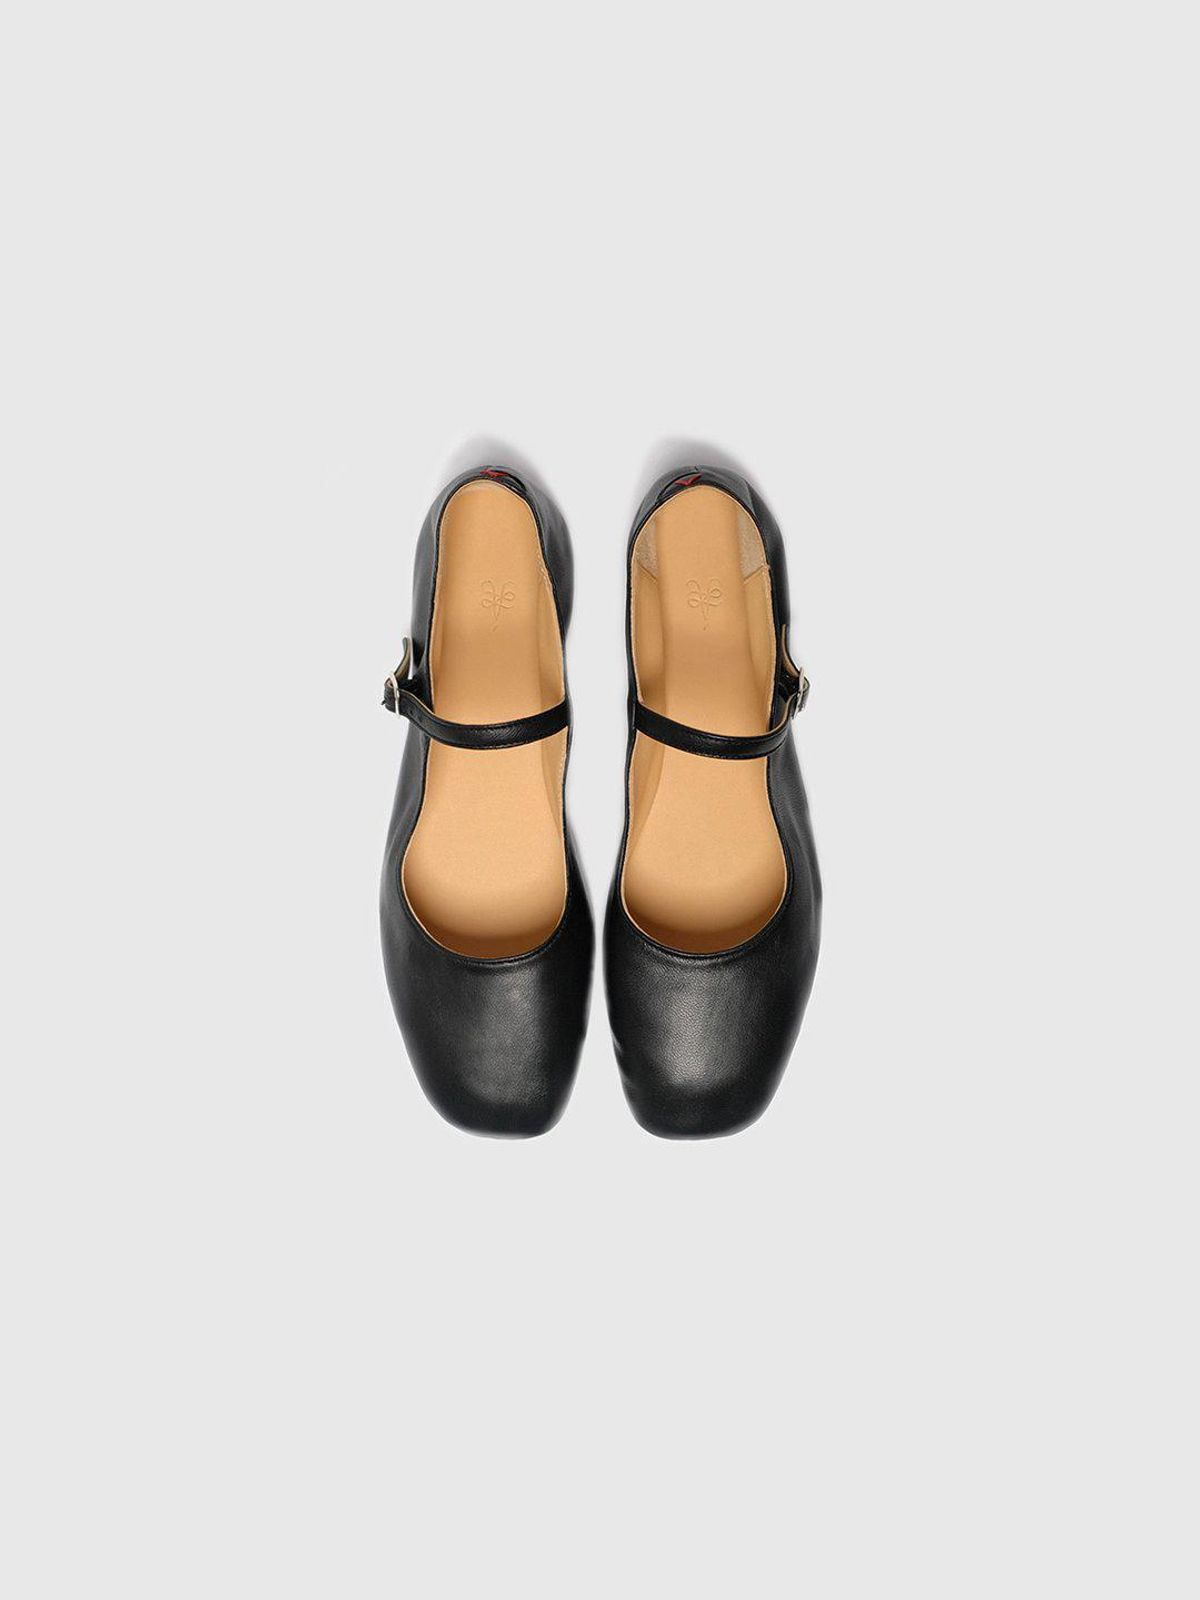 Ayla Shoes